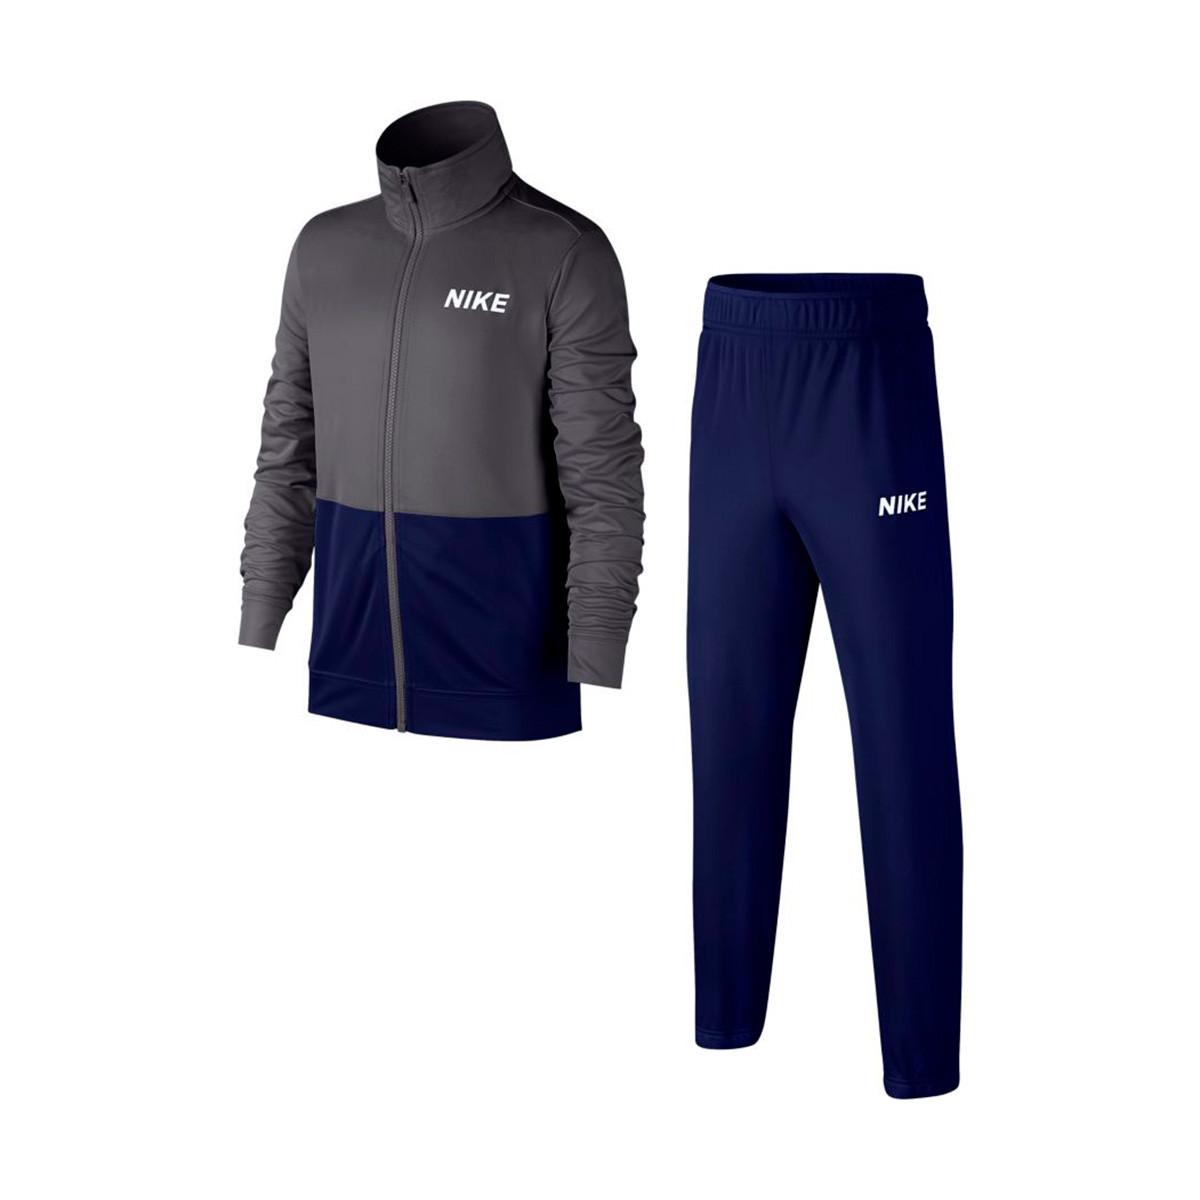 4c46410985 Tracksuit Nike Sportswear Niño Dark grey-Blue void-White - Football ...